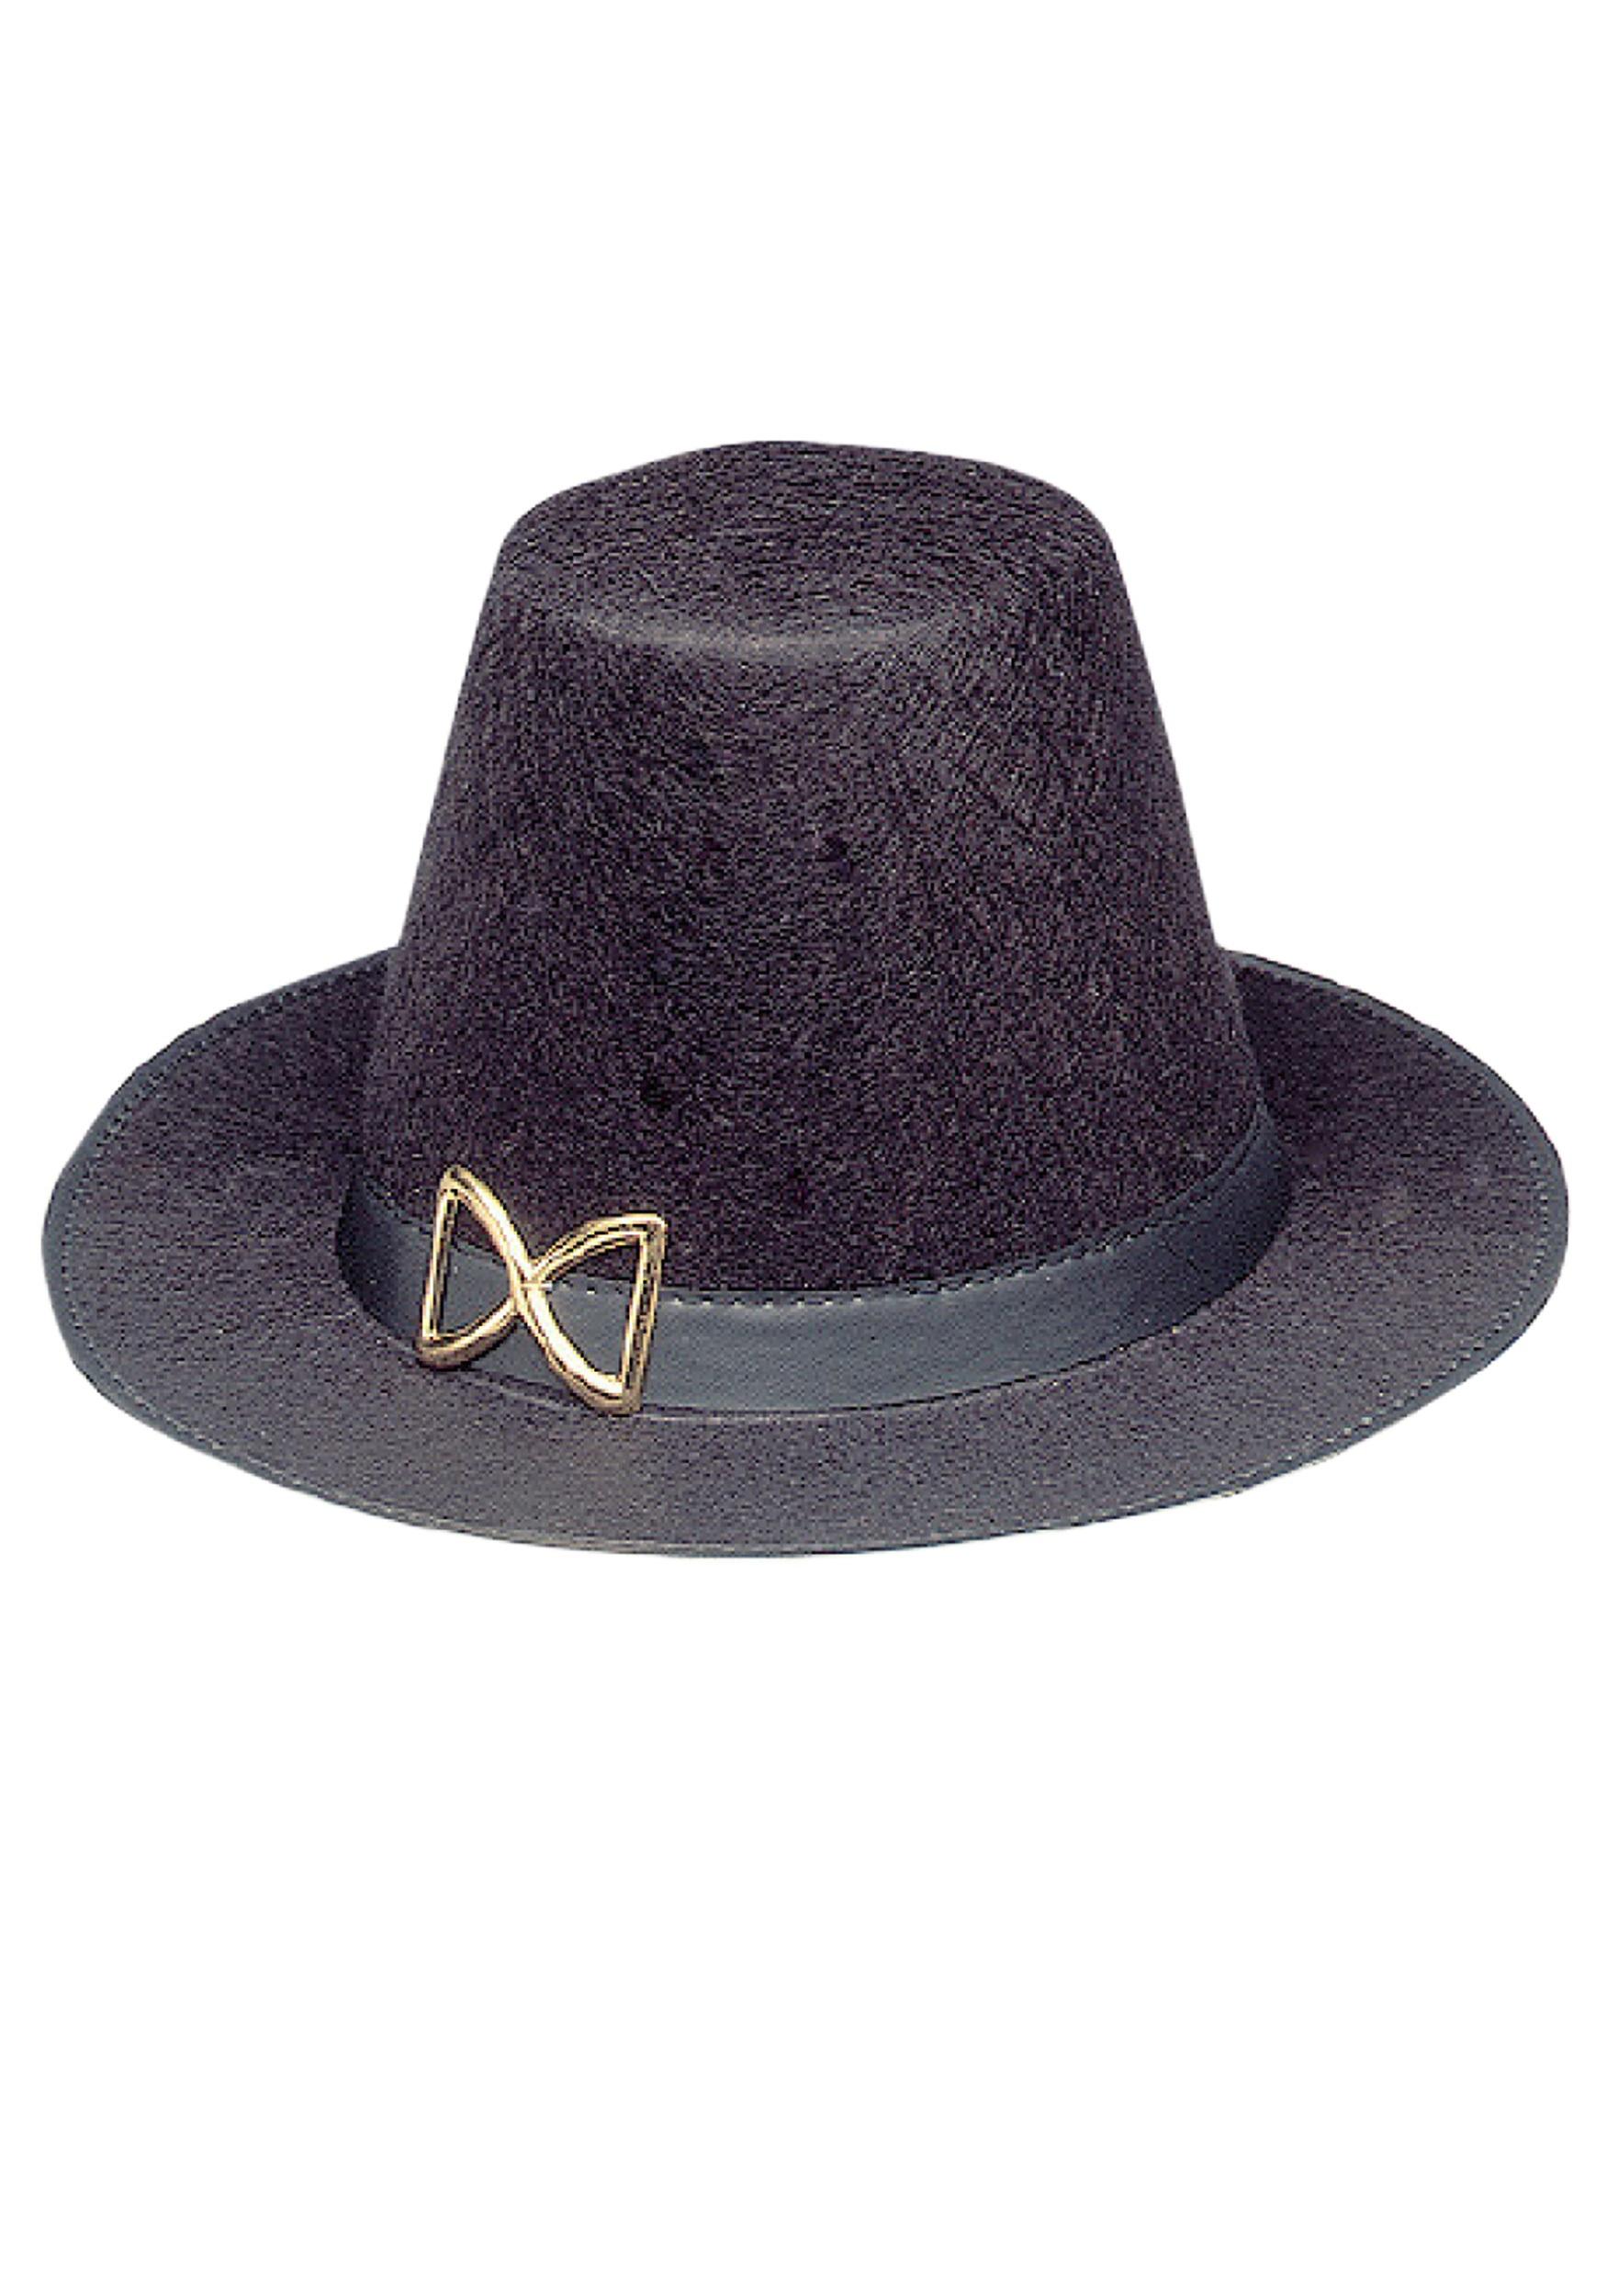 Pilgrim Hats - Tag Hats